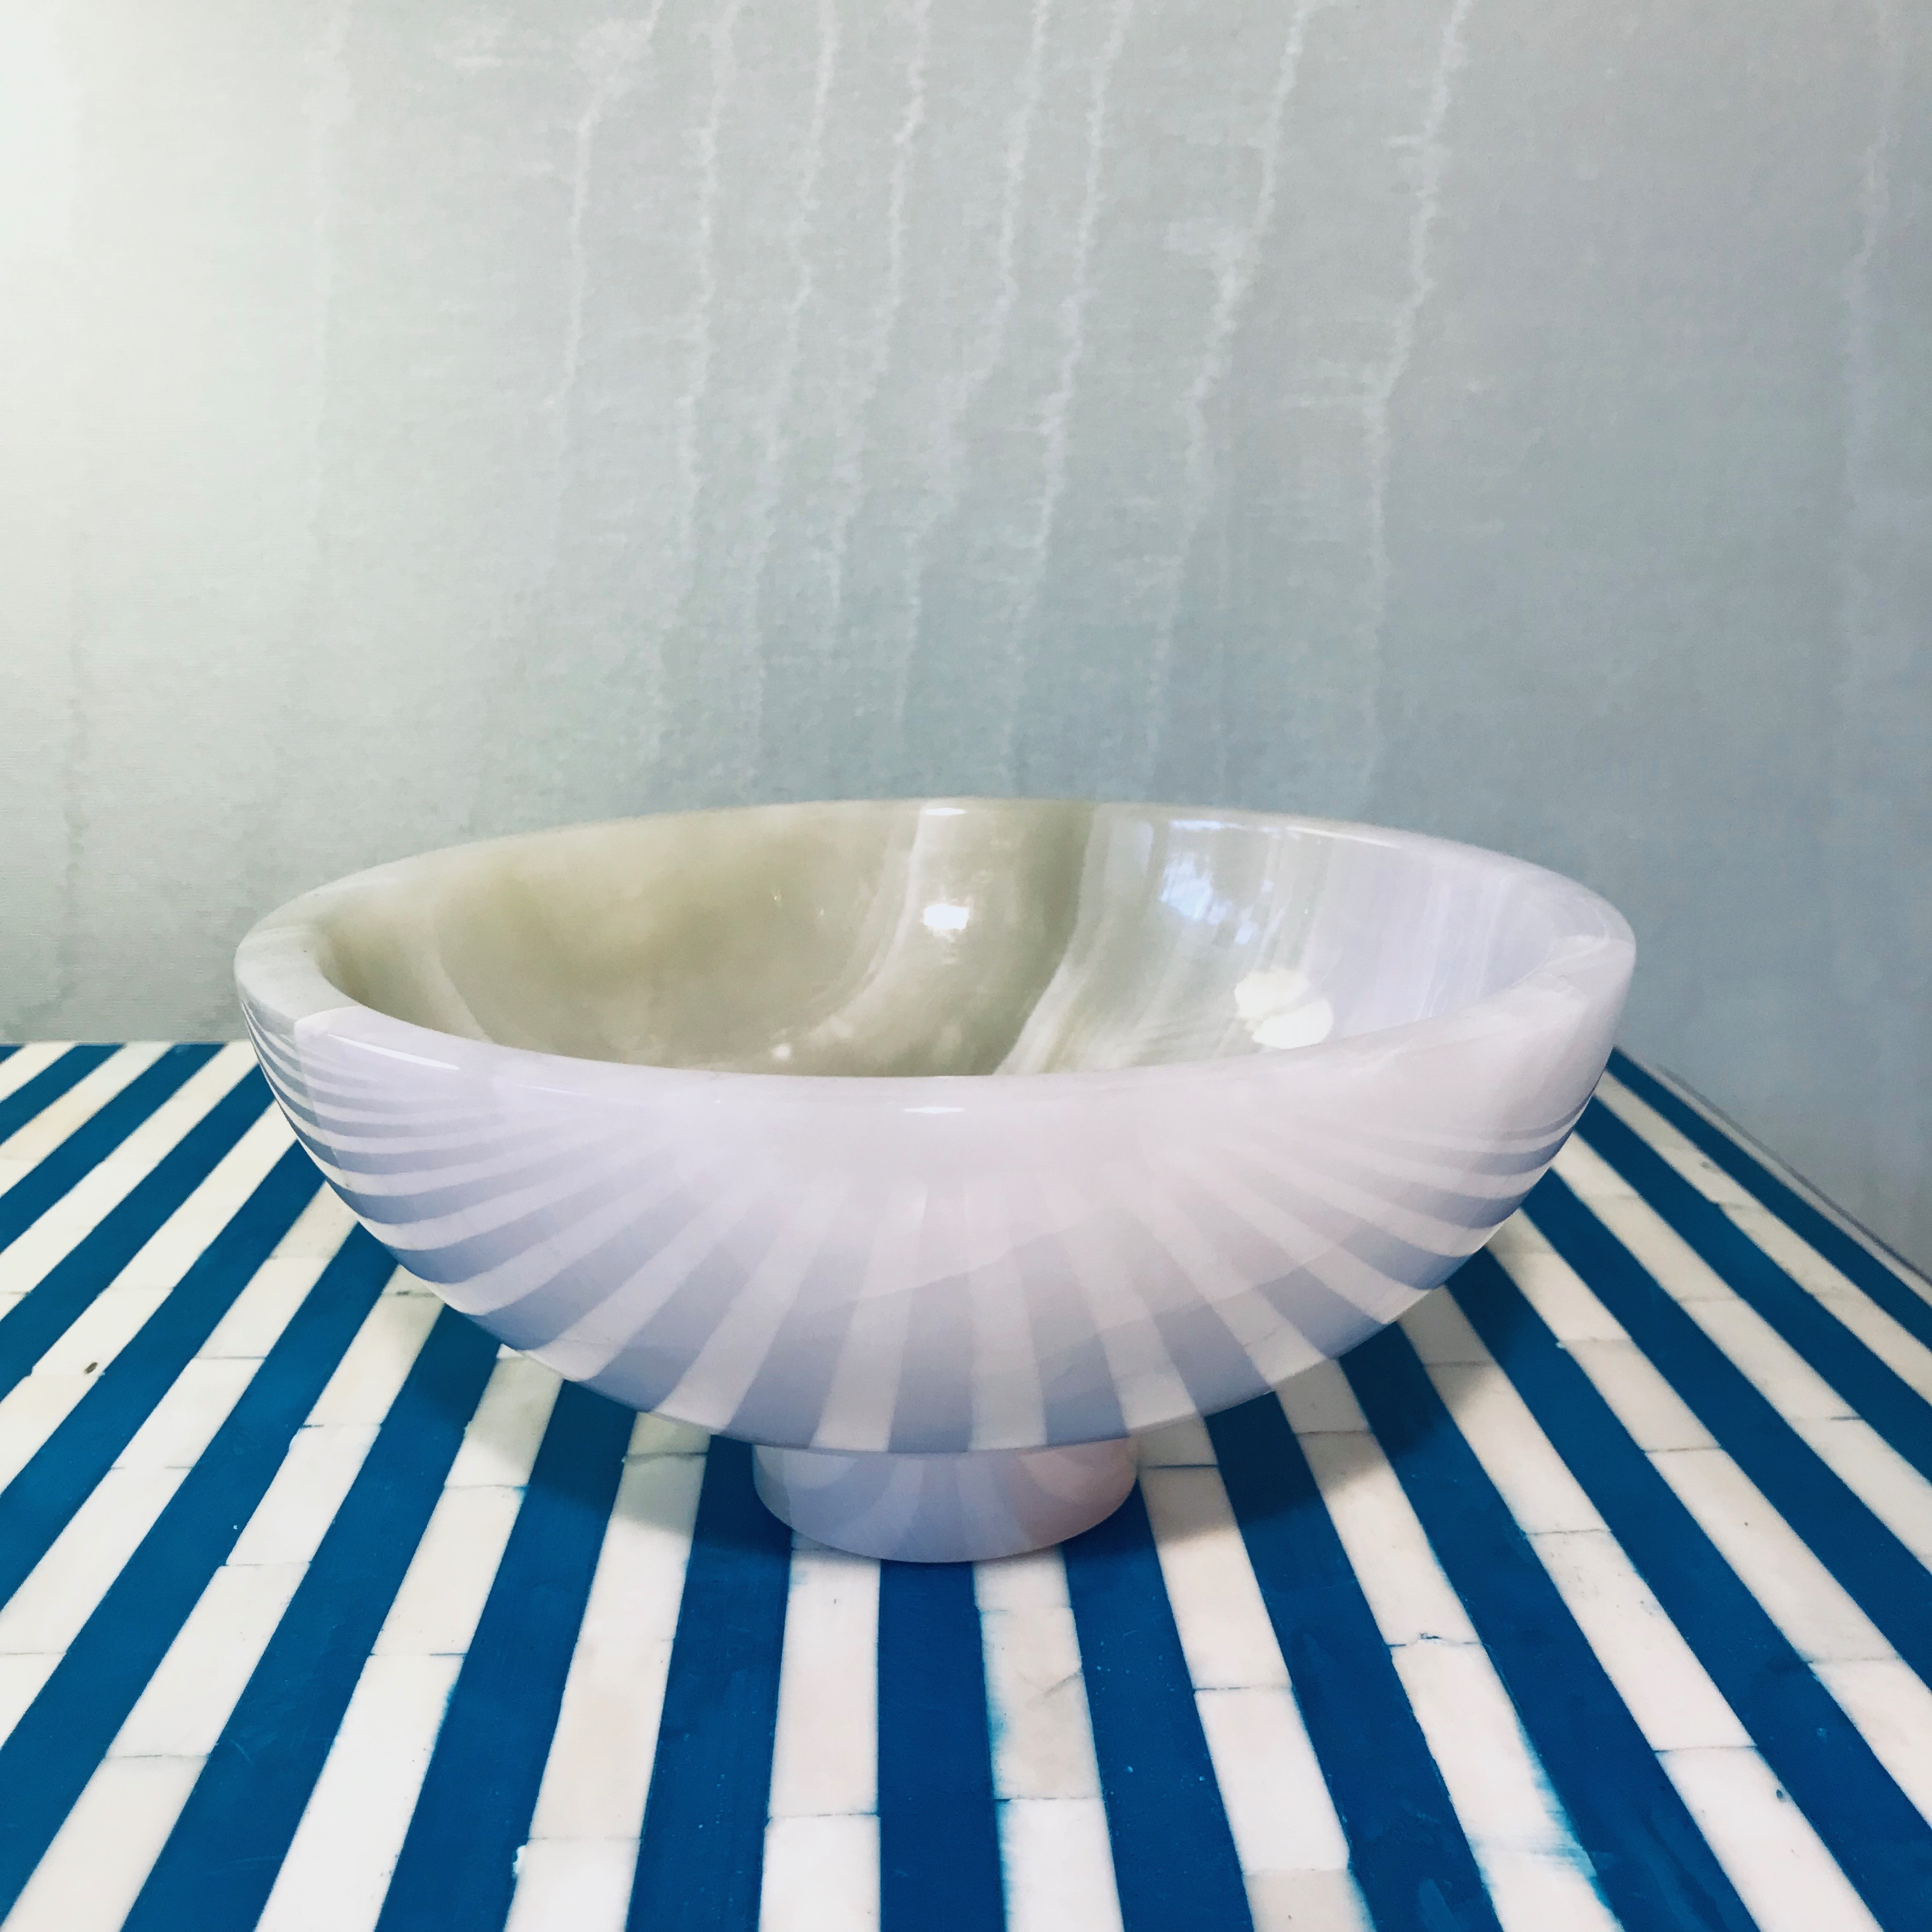 Twosisestory Bowl, Candy Onyx